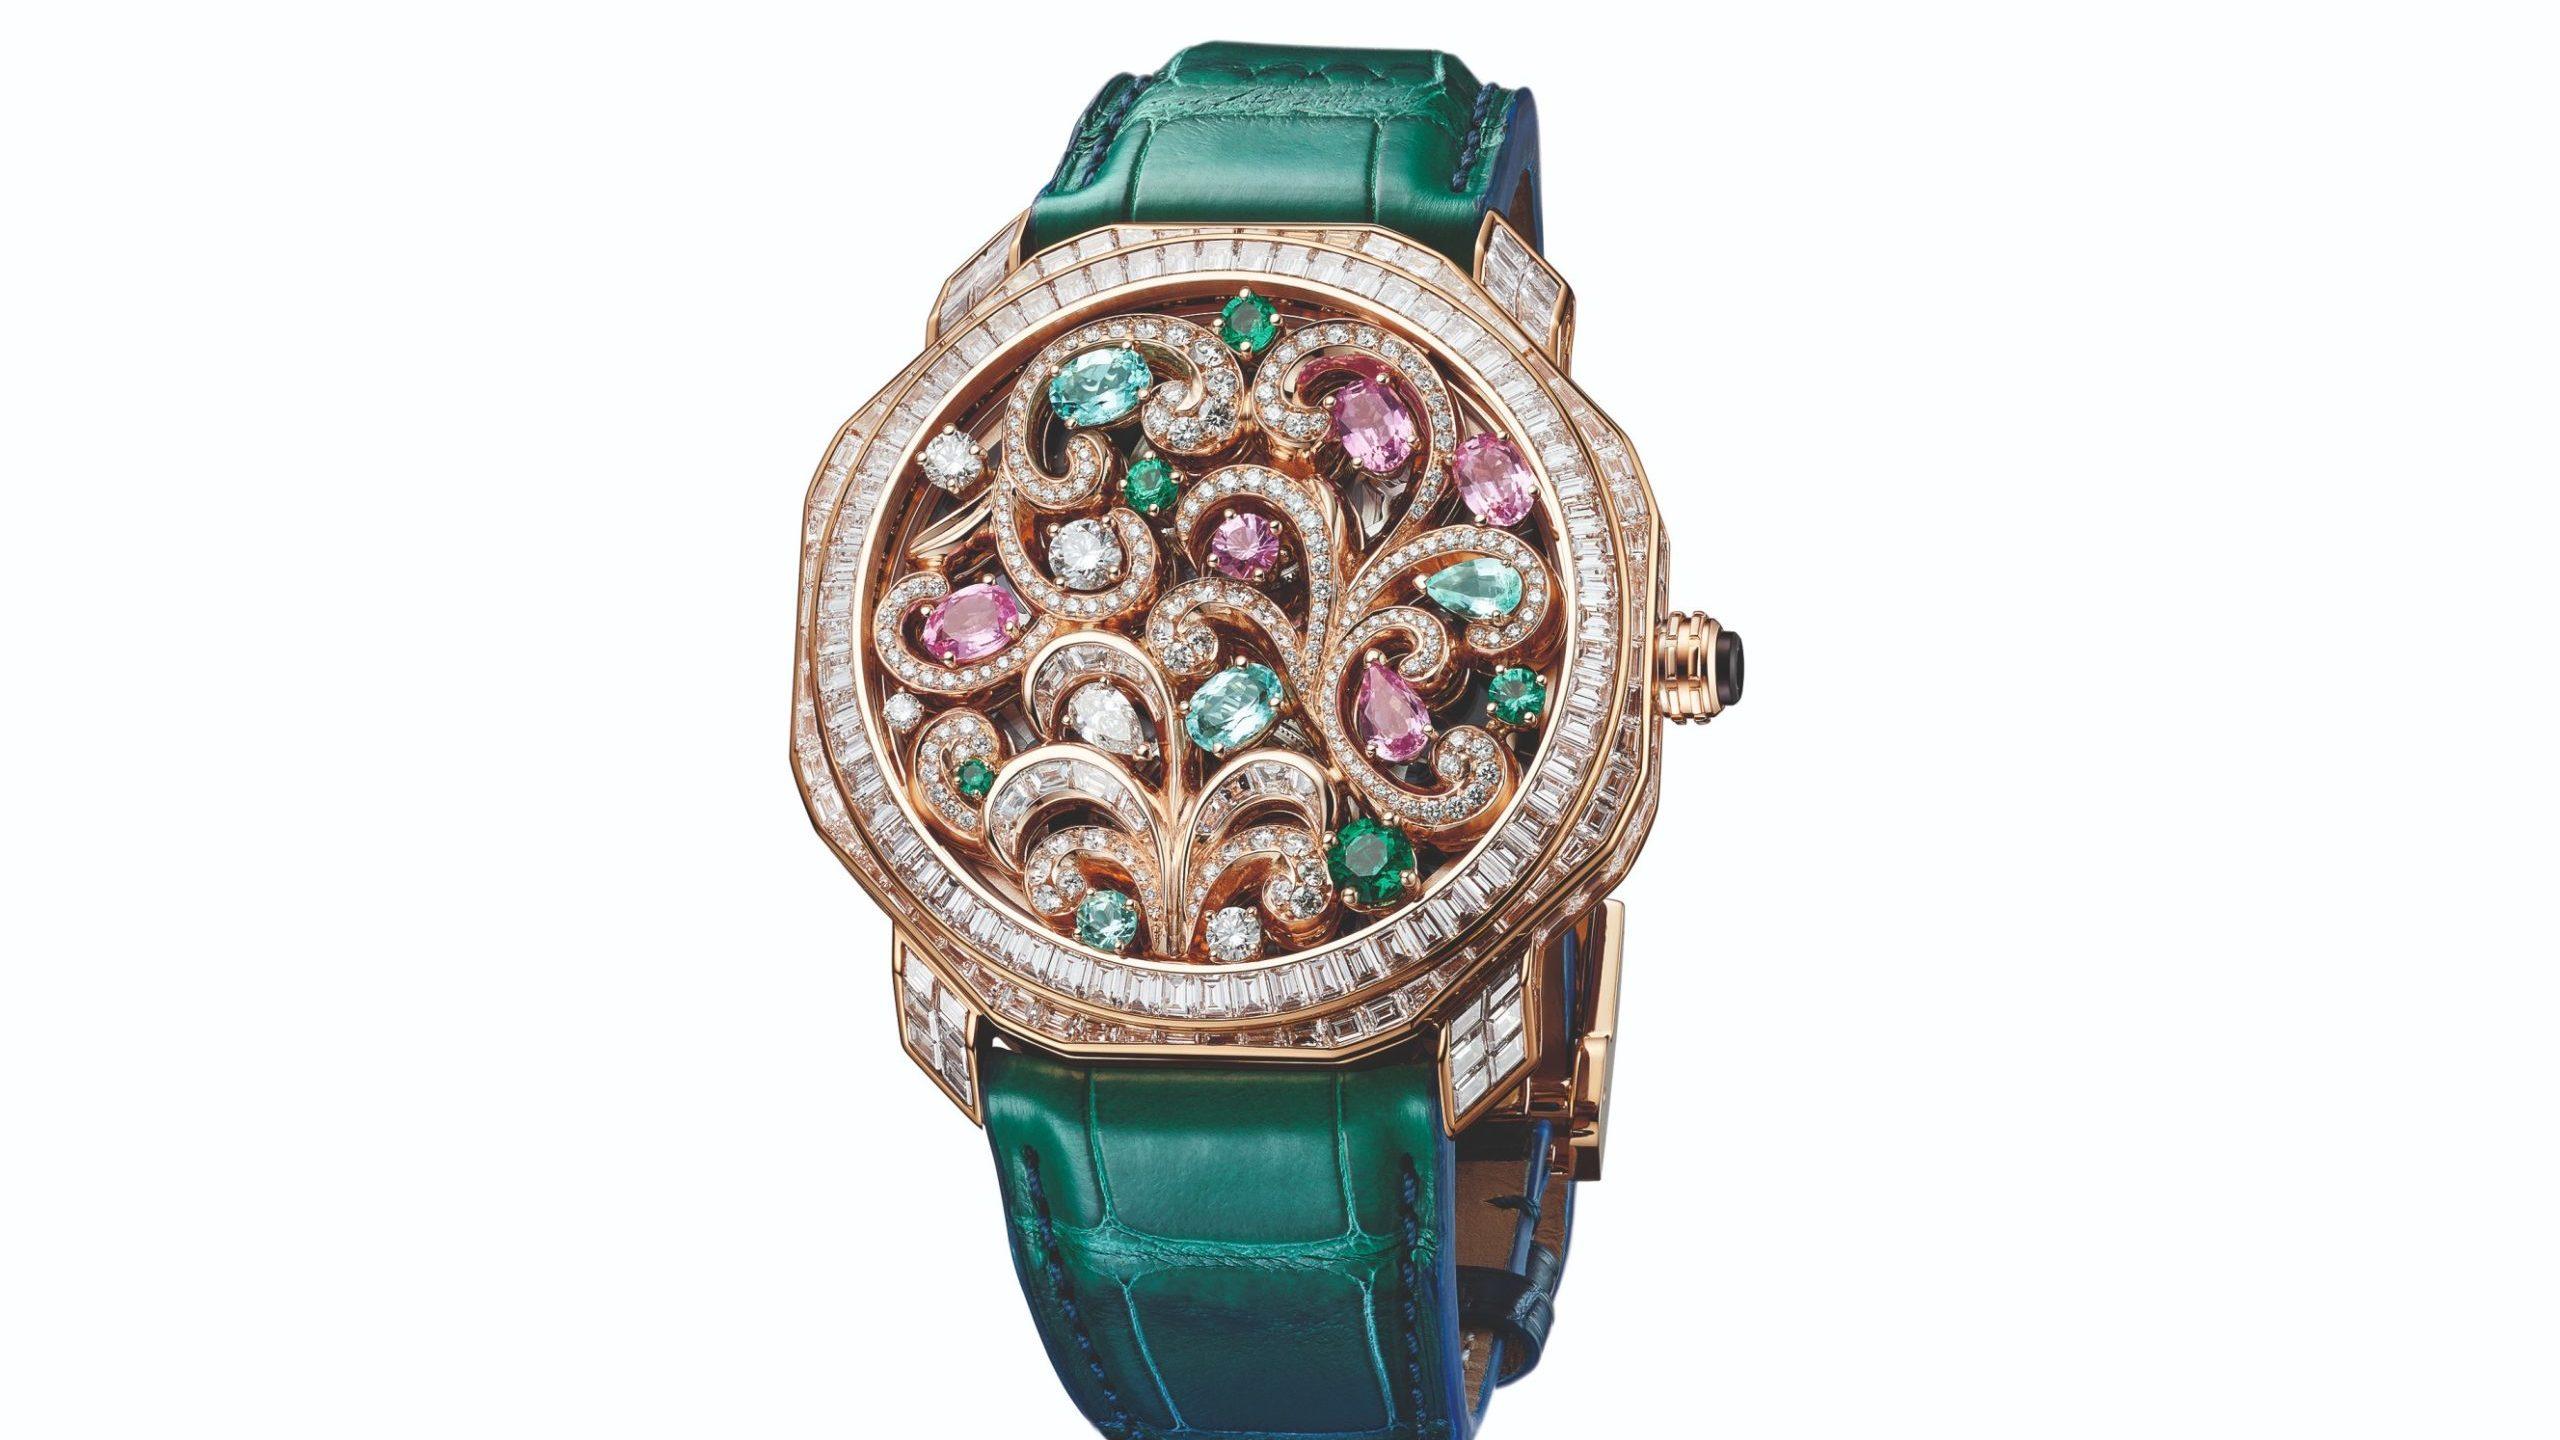 Barocko reloj Bvlgari